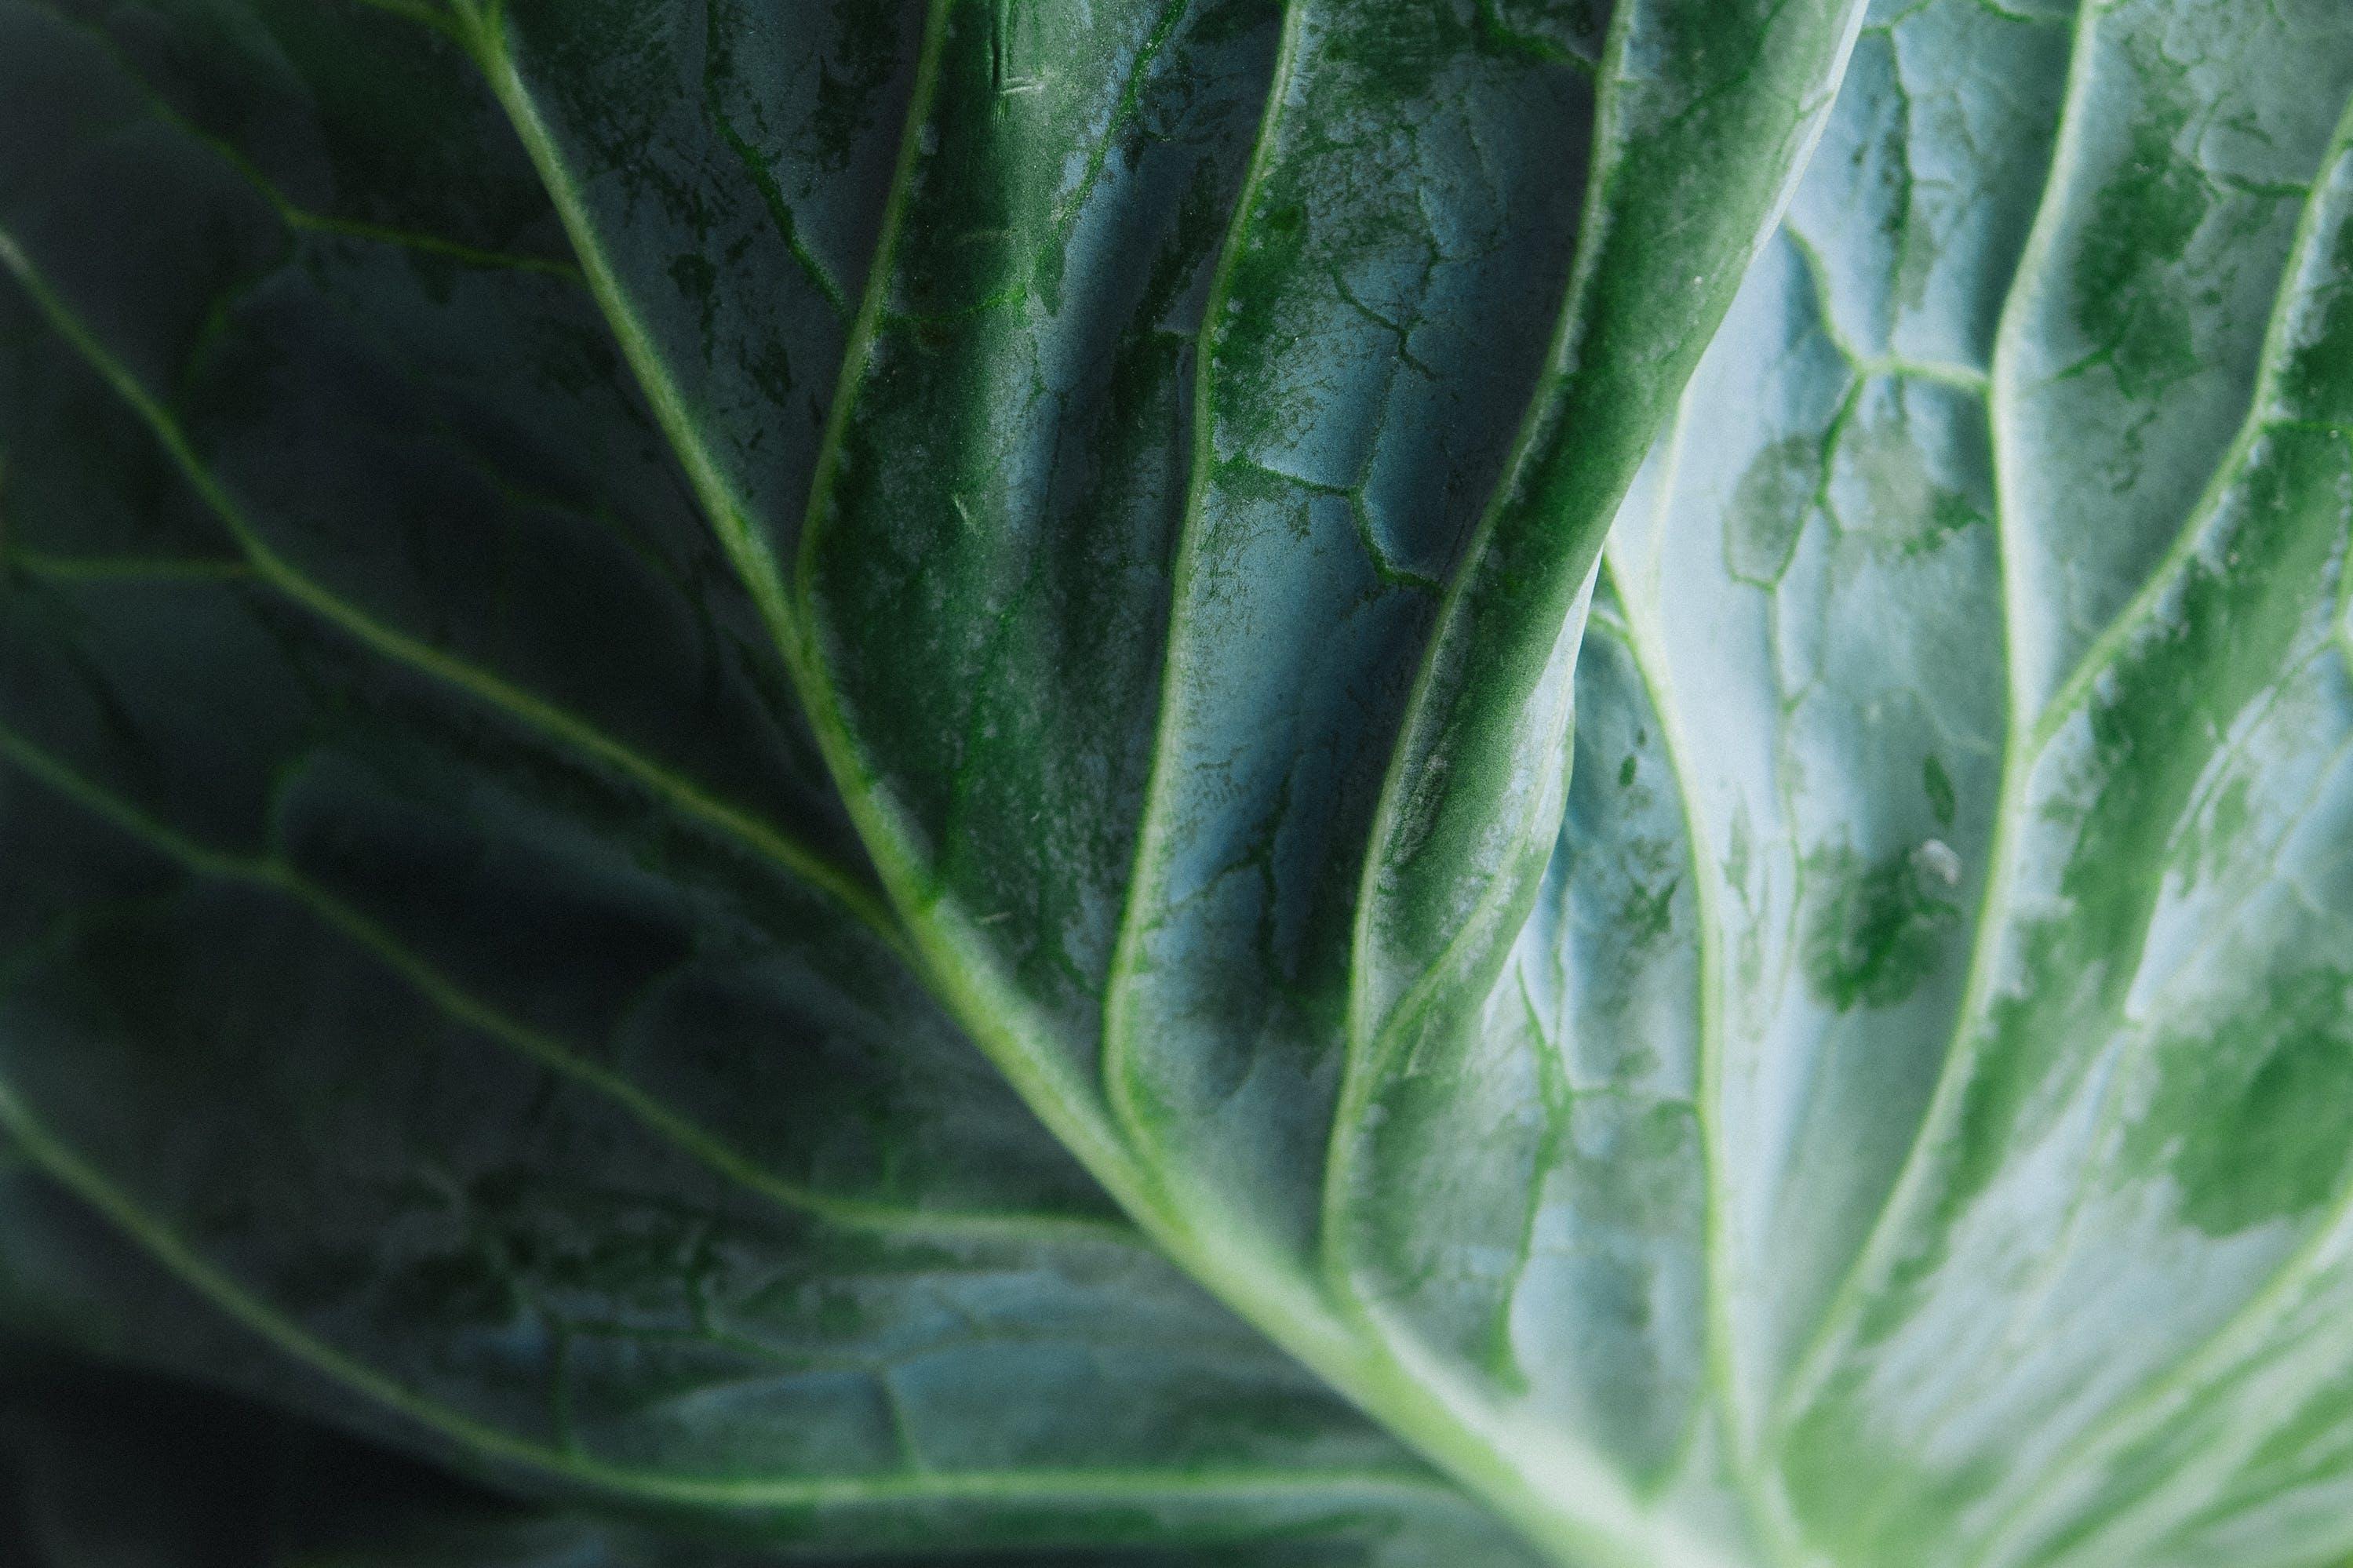 Free stock photo of food, vegetables, lettuce, veggies